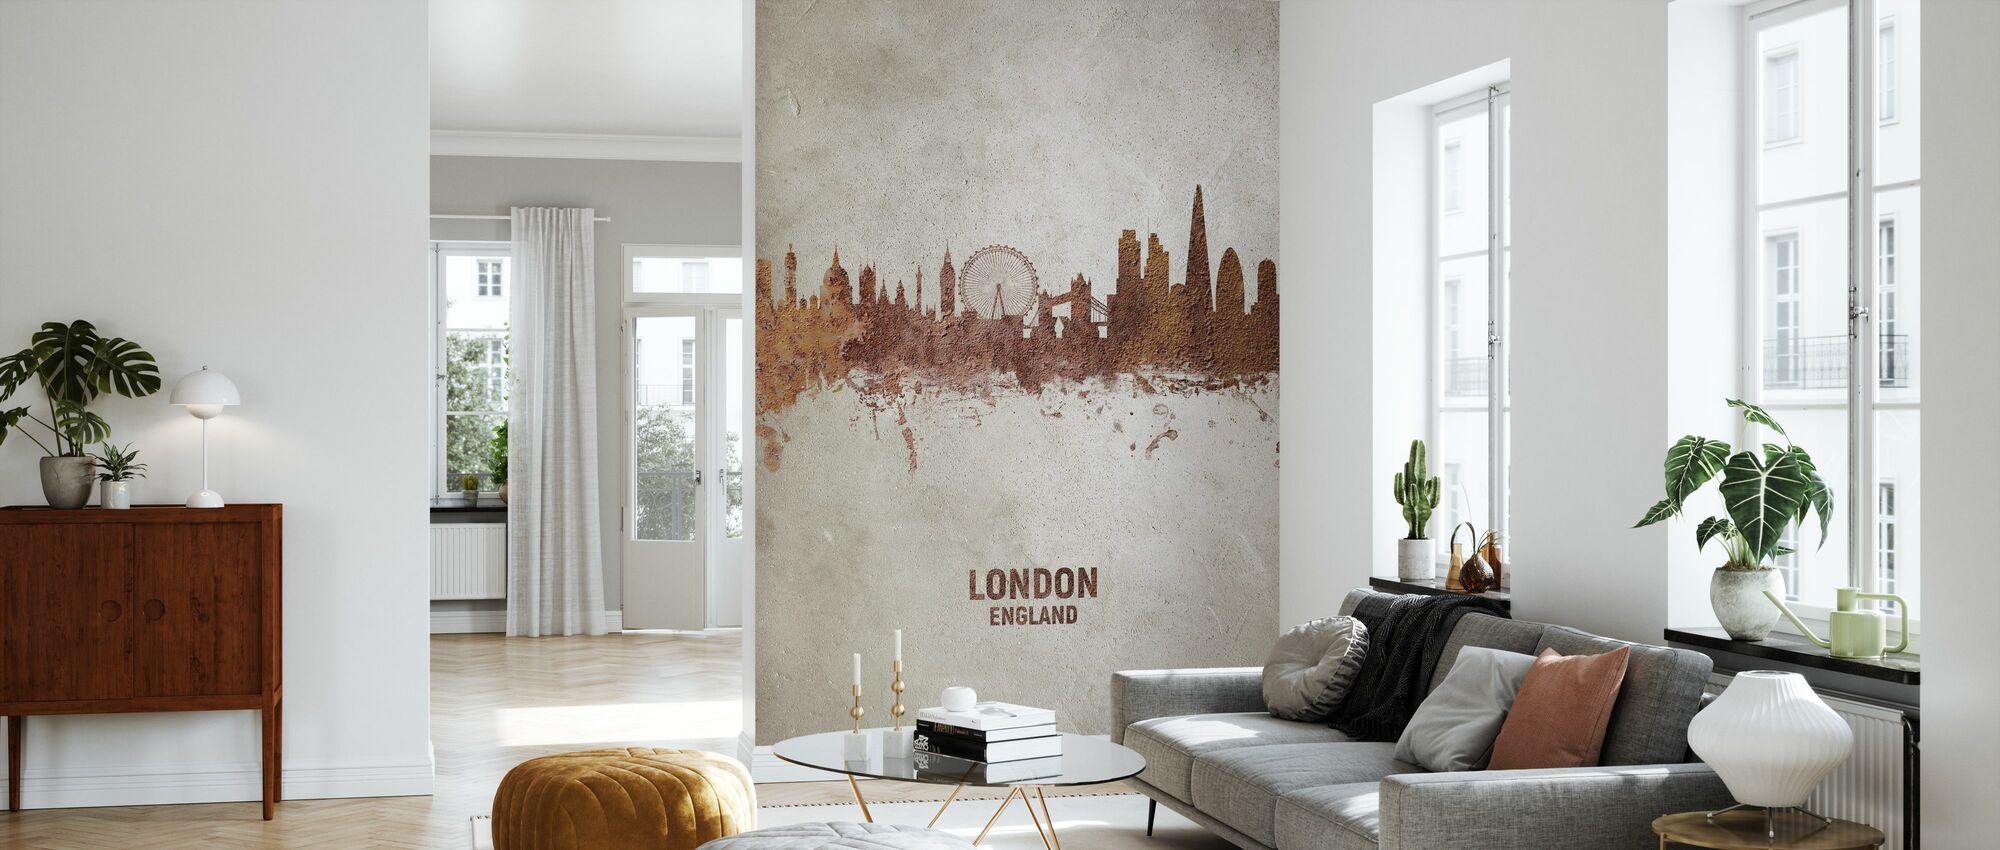 London England Rust Skyline - Tapet - Stue